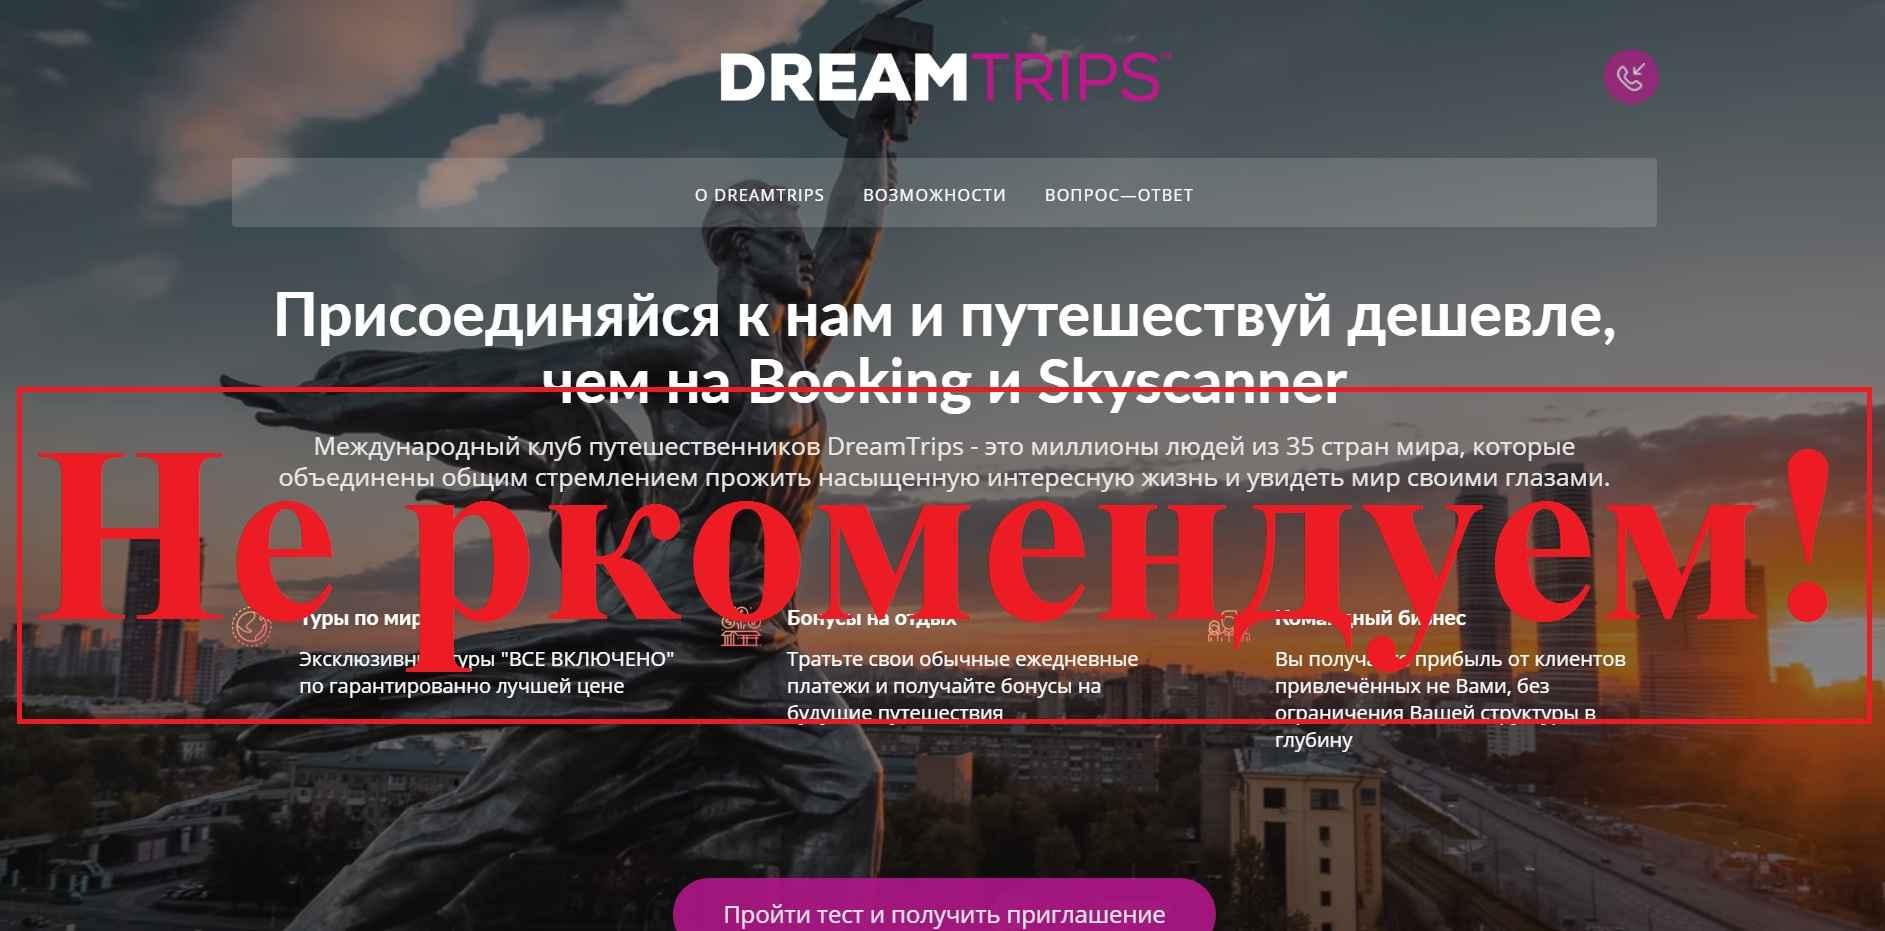 DreamTrips (Дрим Трипс) – реальные отзывы. Развод?